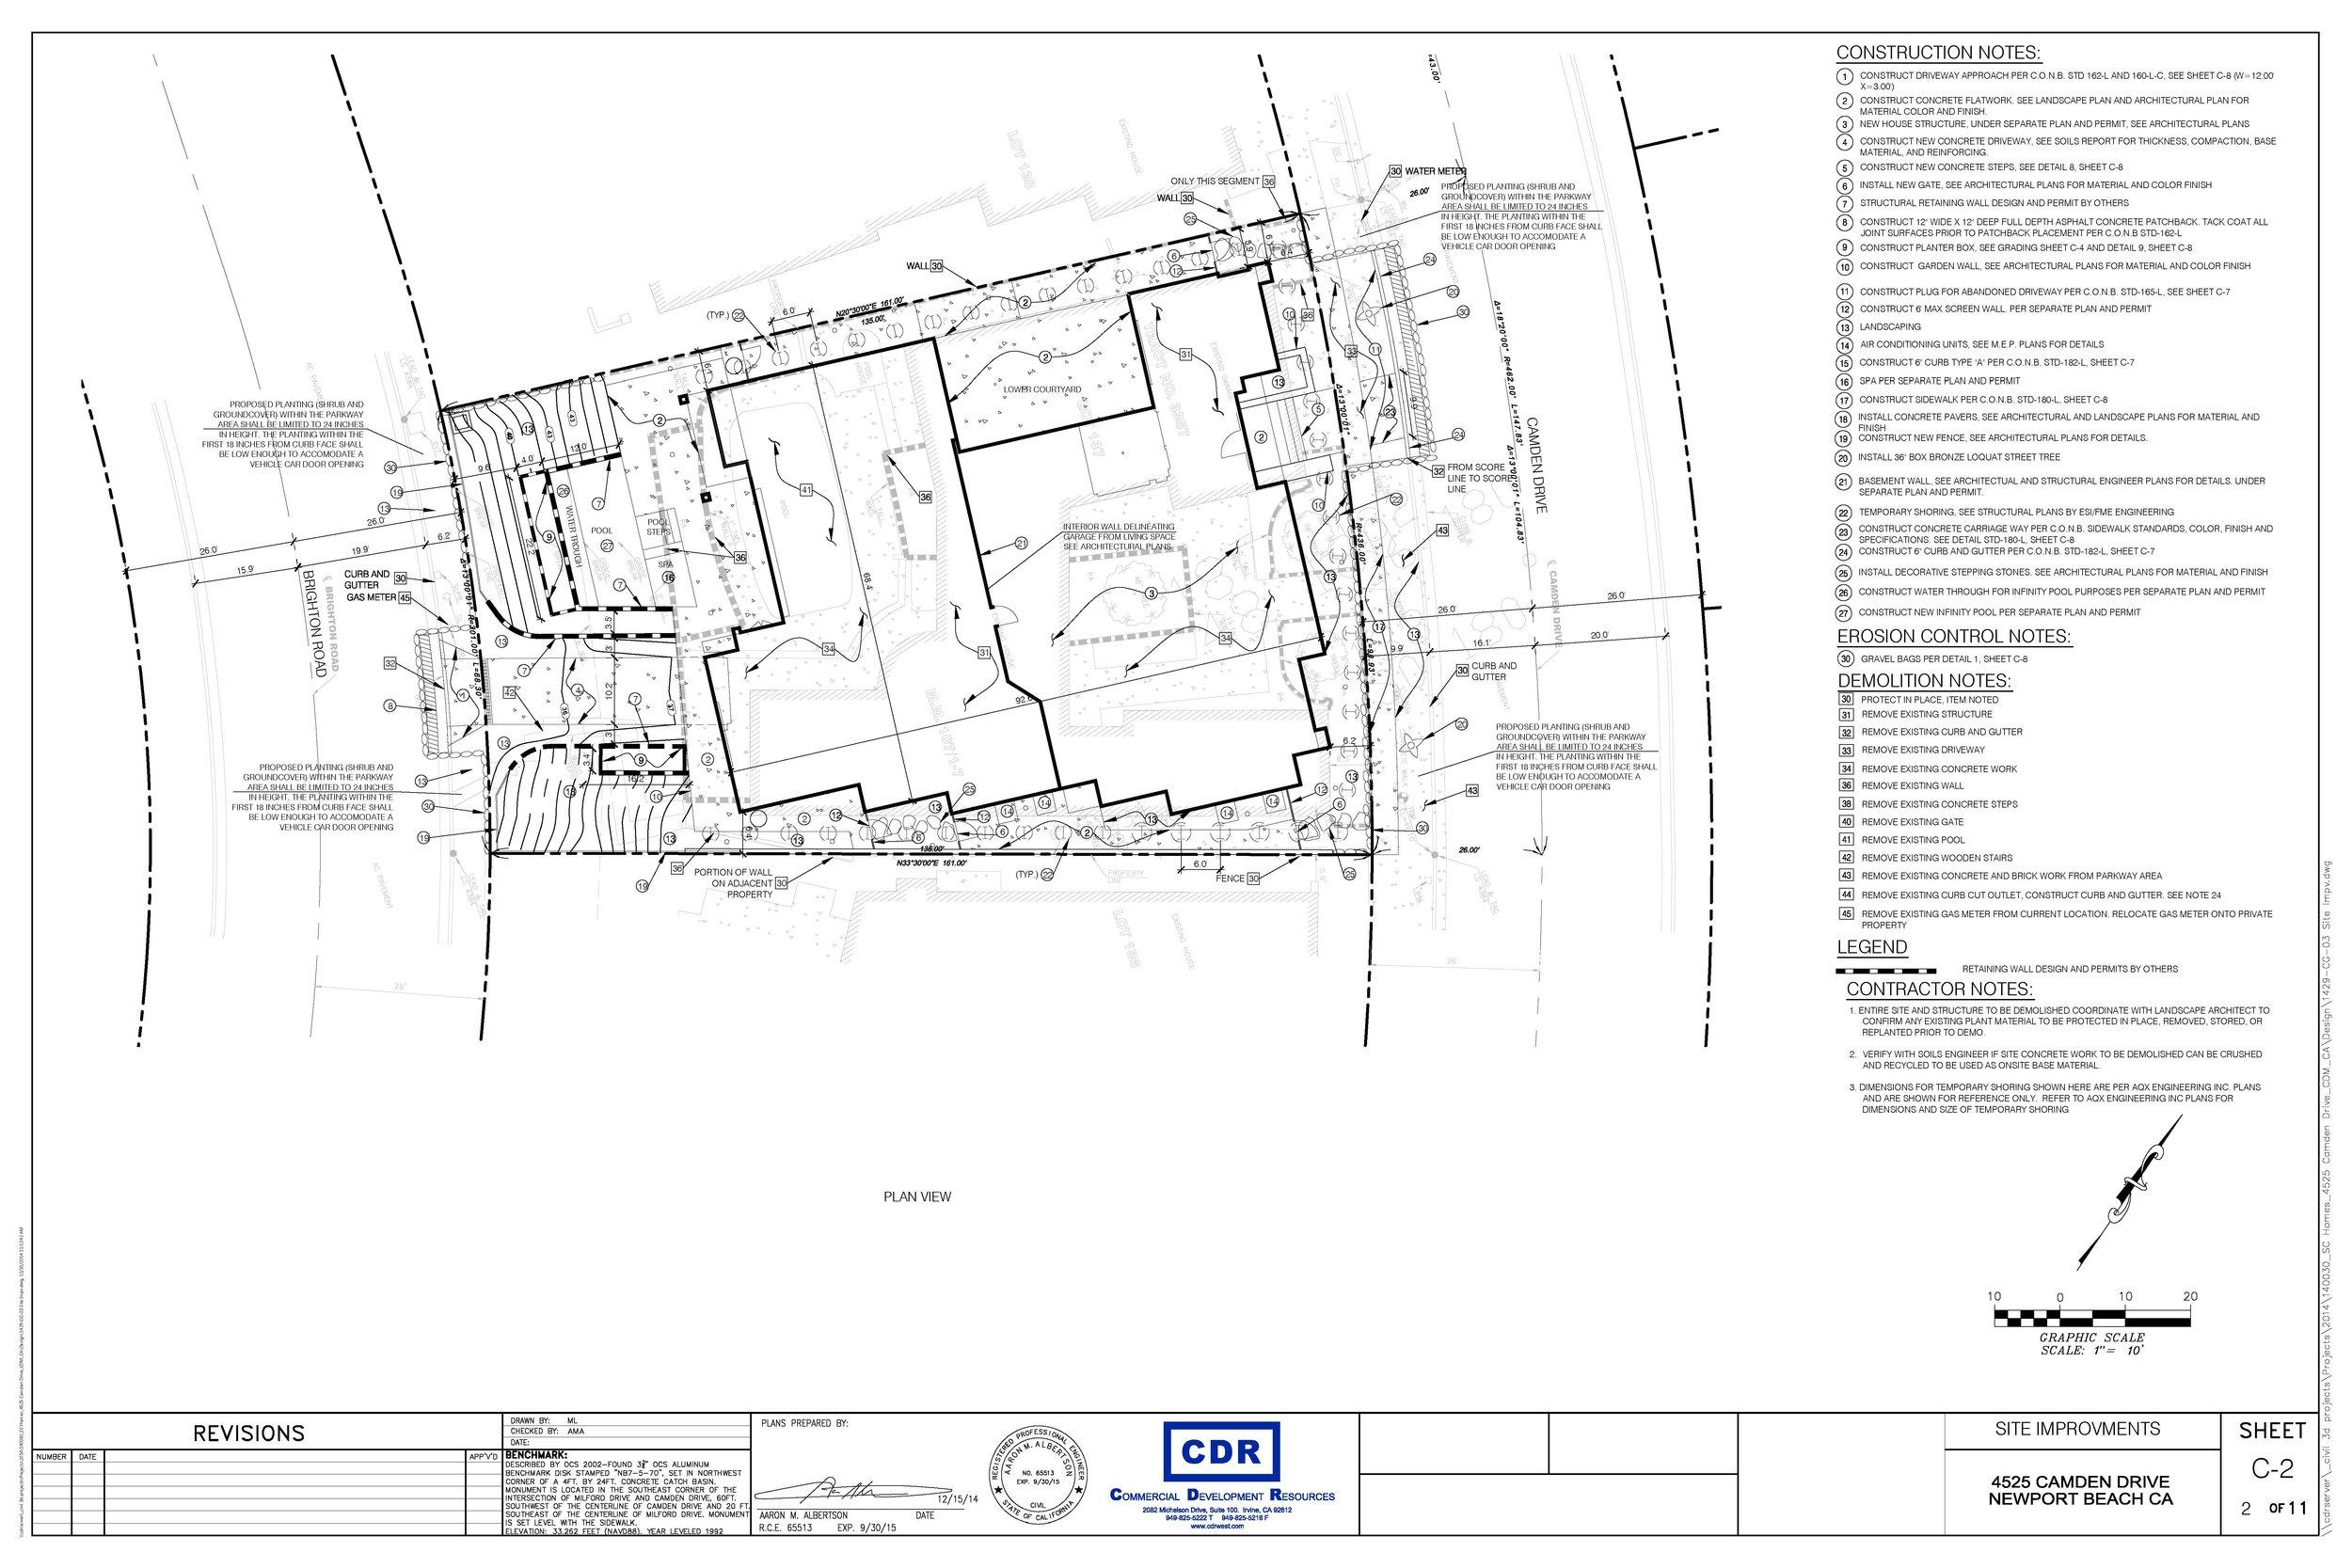 1429-CG-03 Site Impv-Layout1.jpg